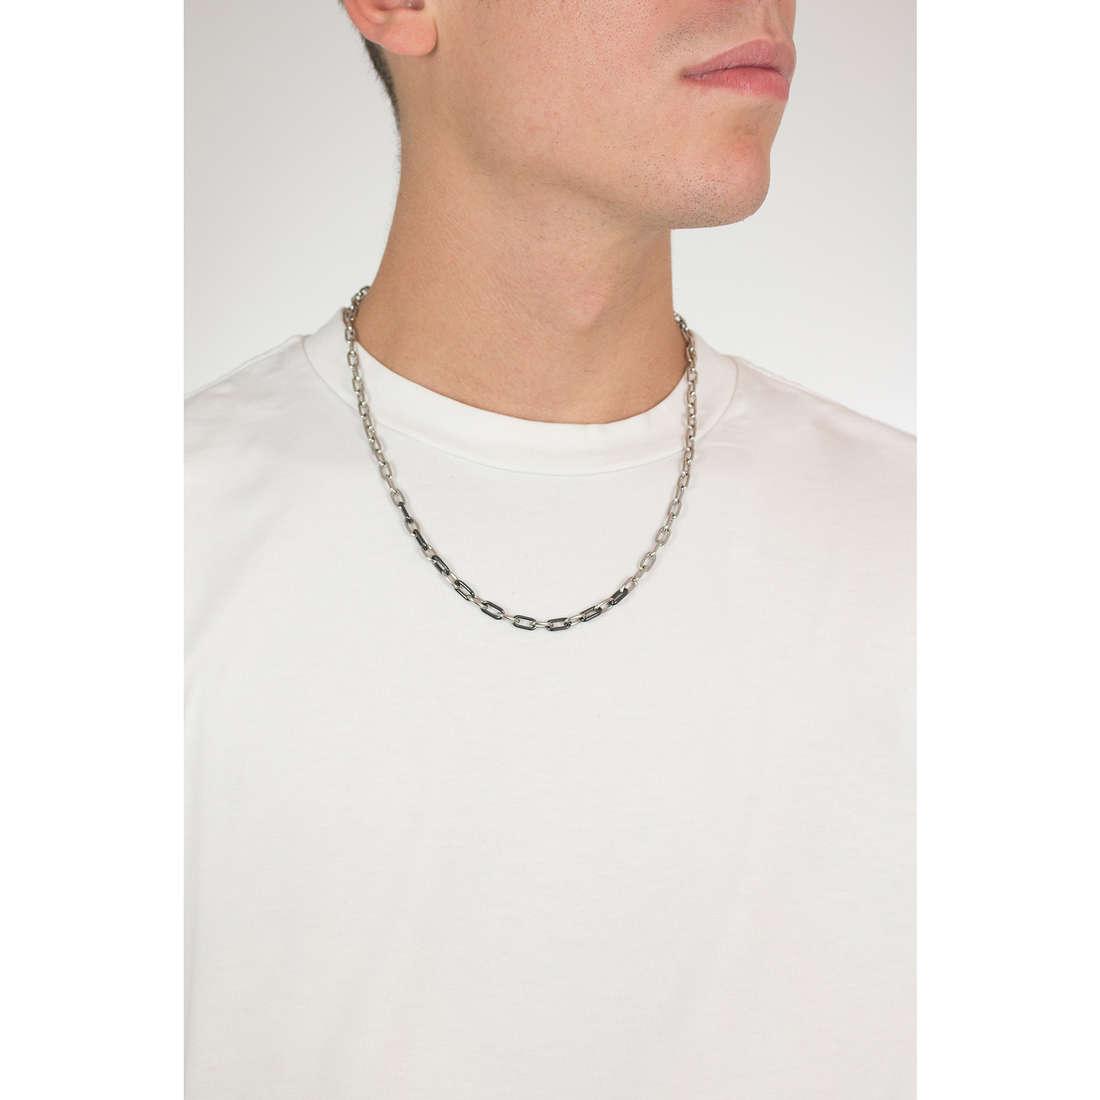 Morellato necklaces Cross man SAHU02 photo wearing